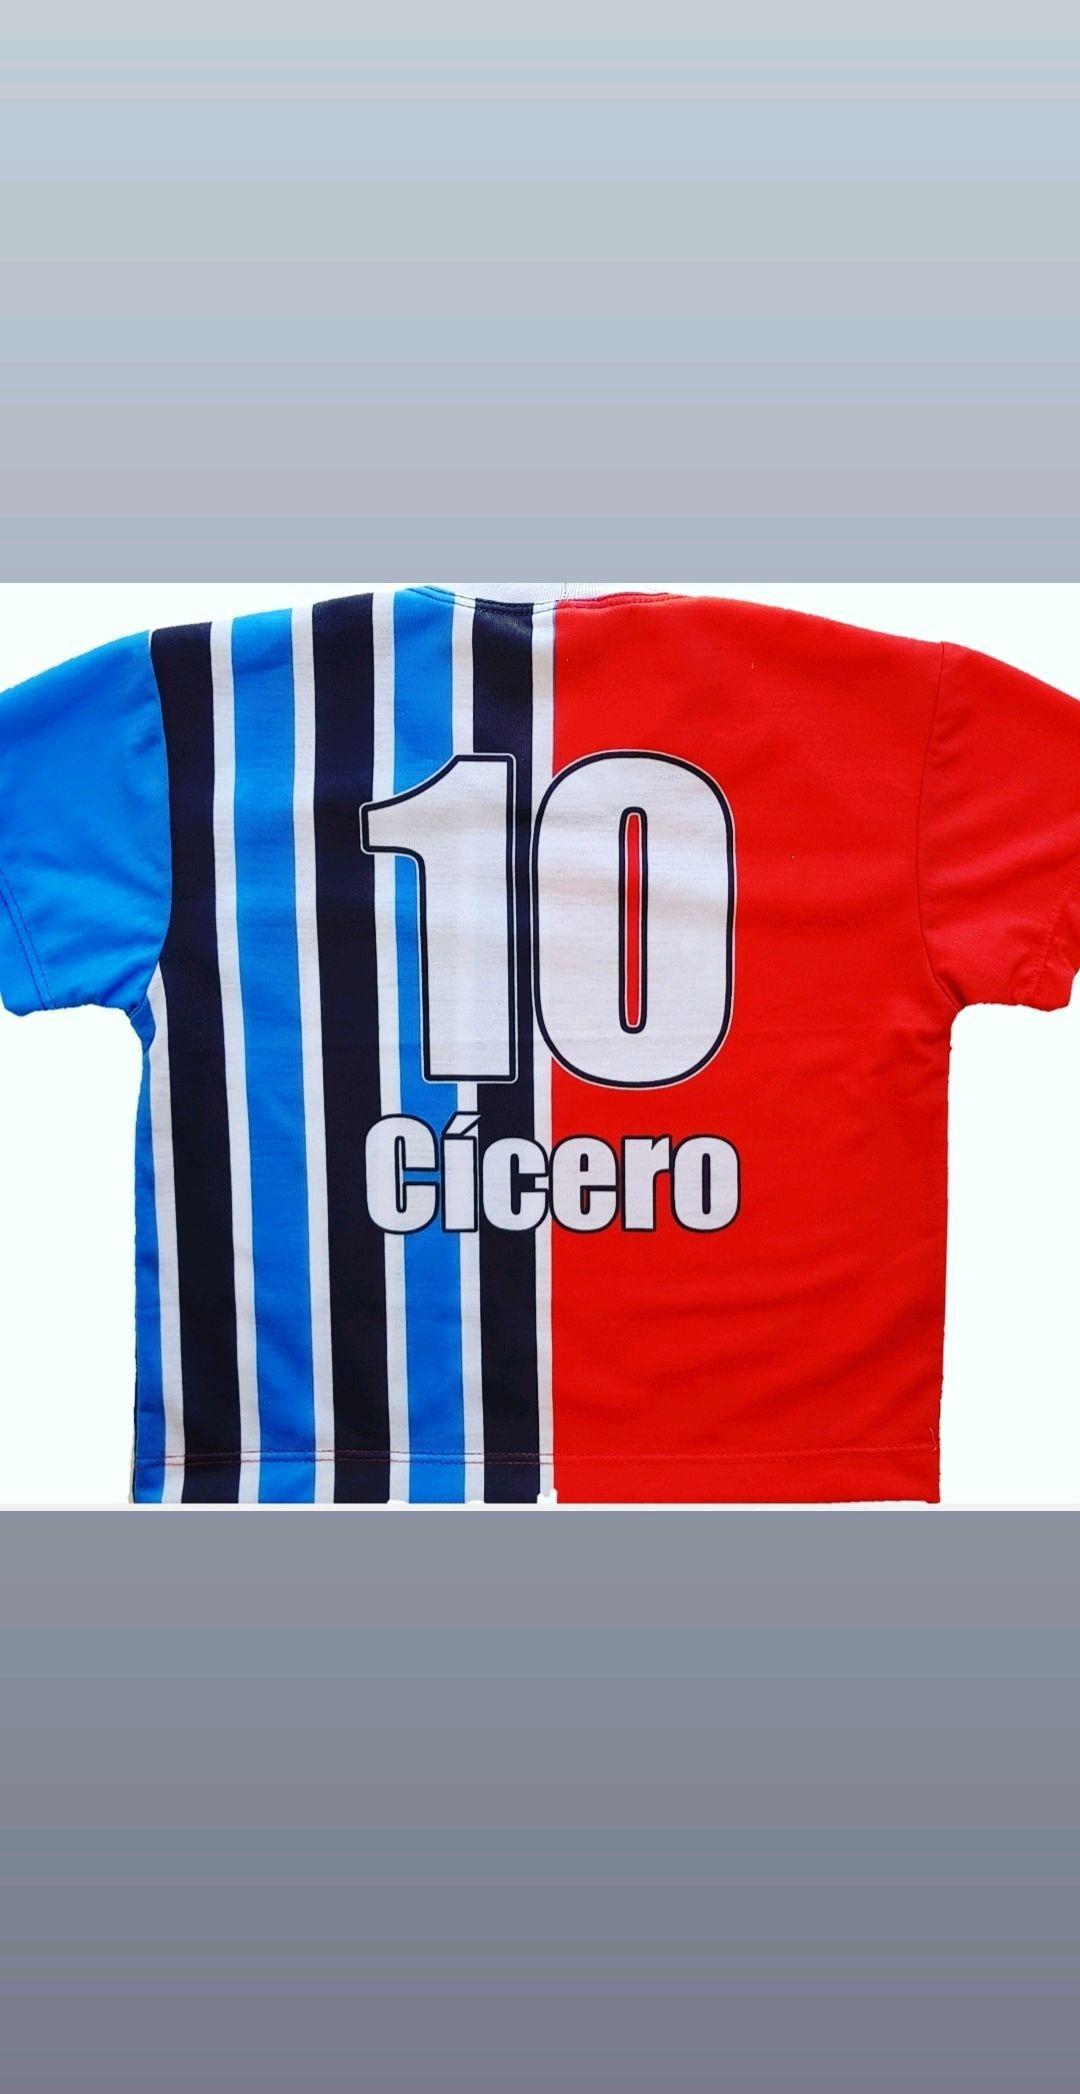 52463b3c66431 Camiseta infantil grenal time grêmio internacional no Elo7 ...